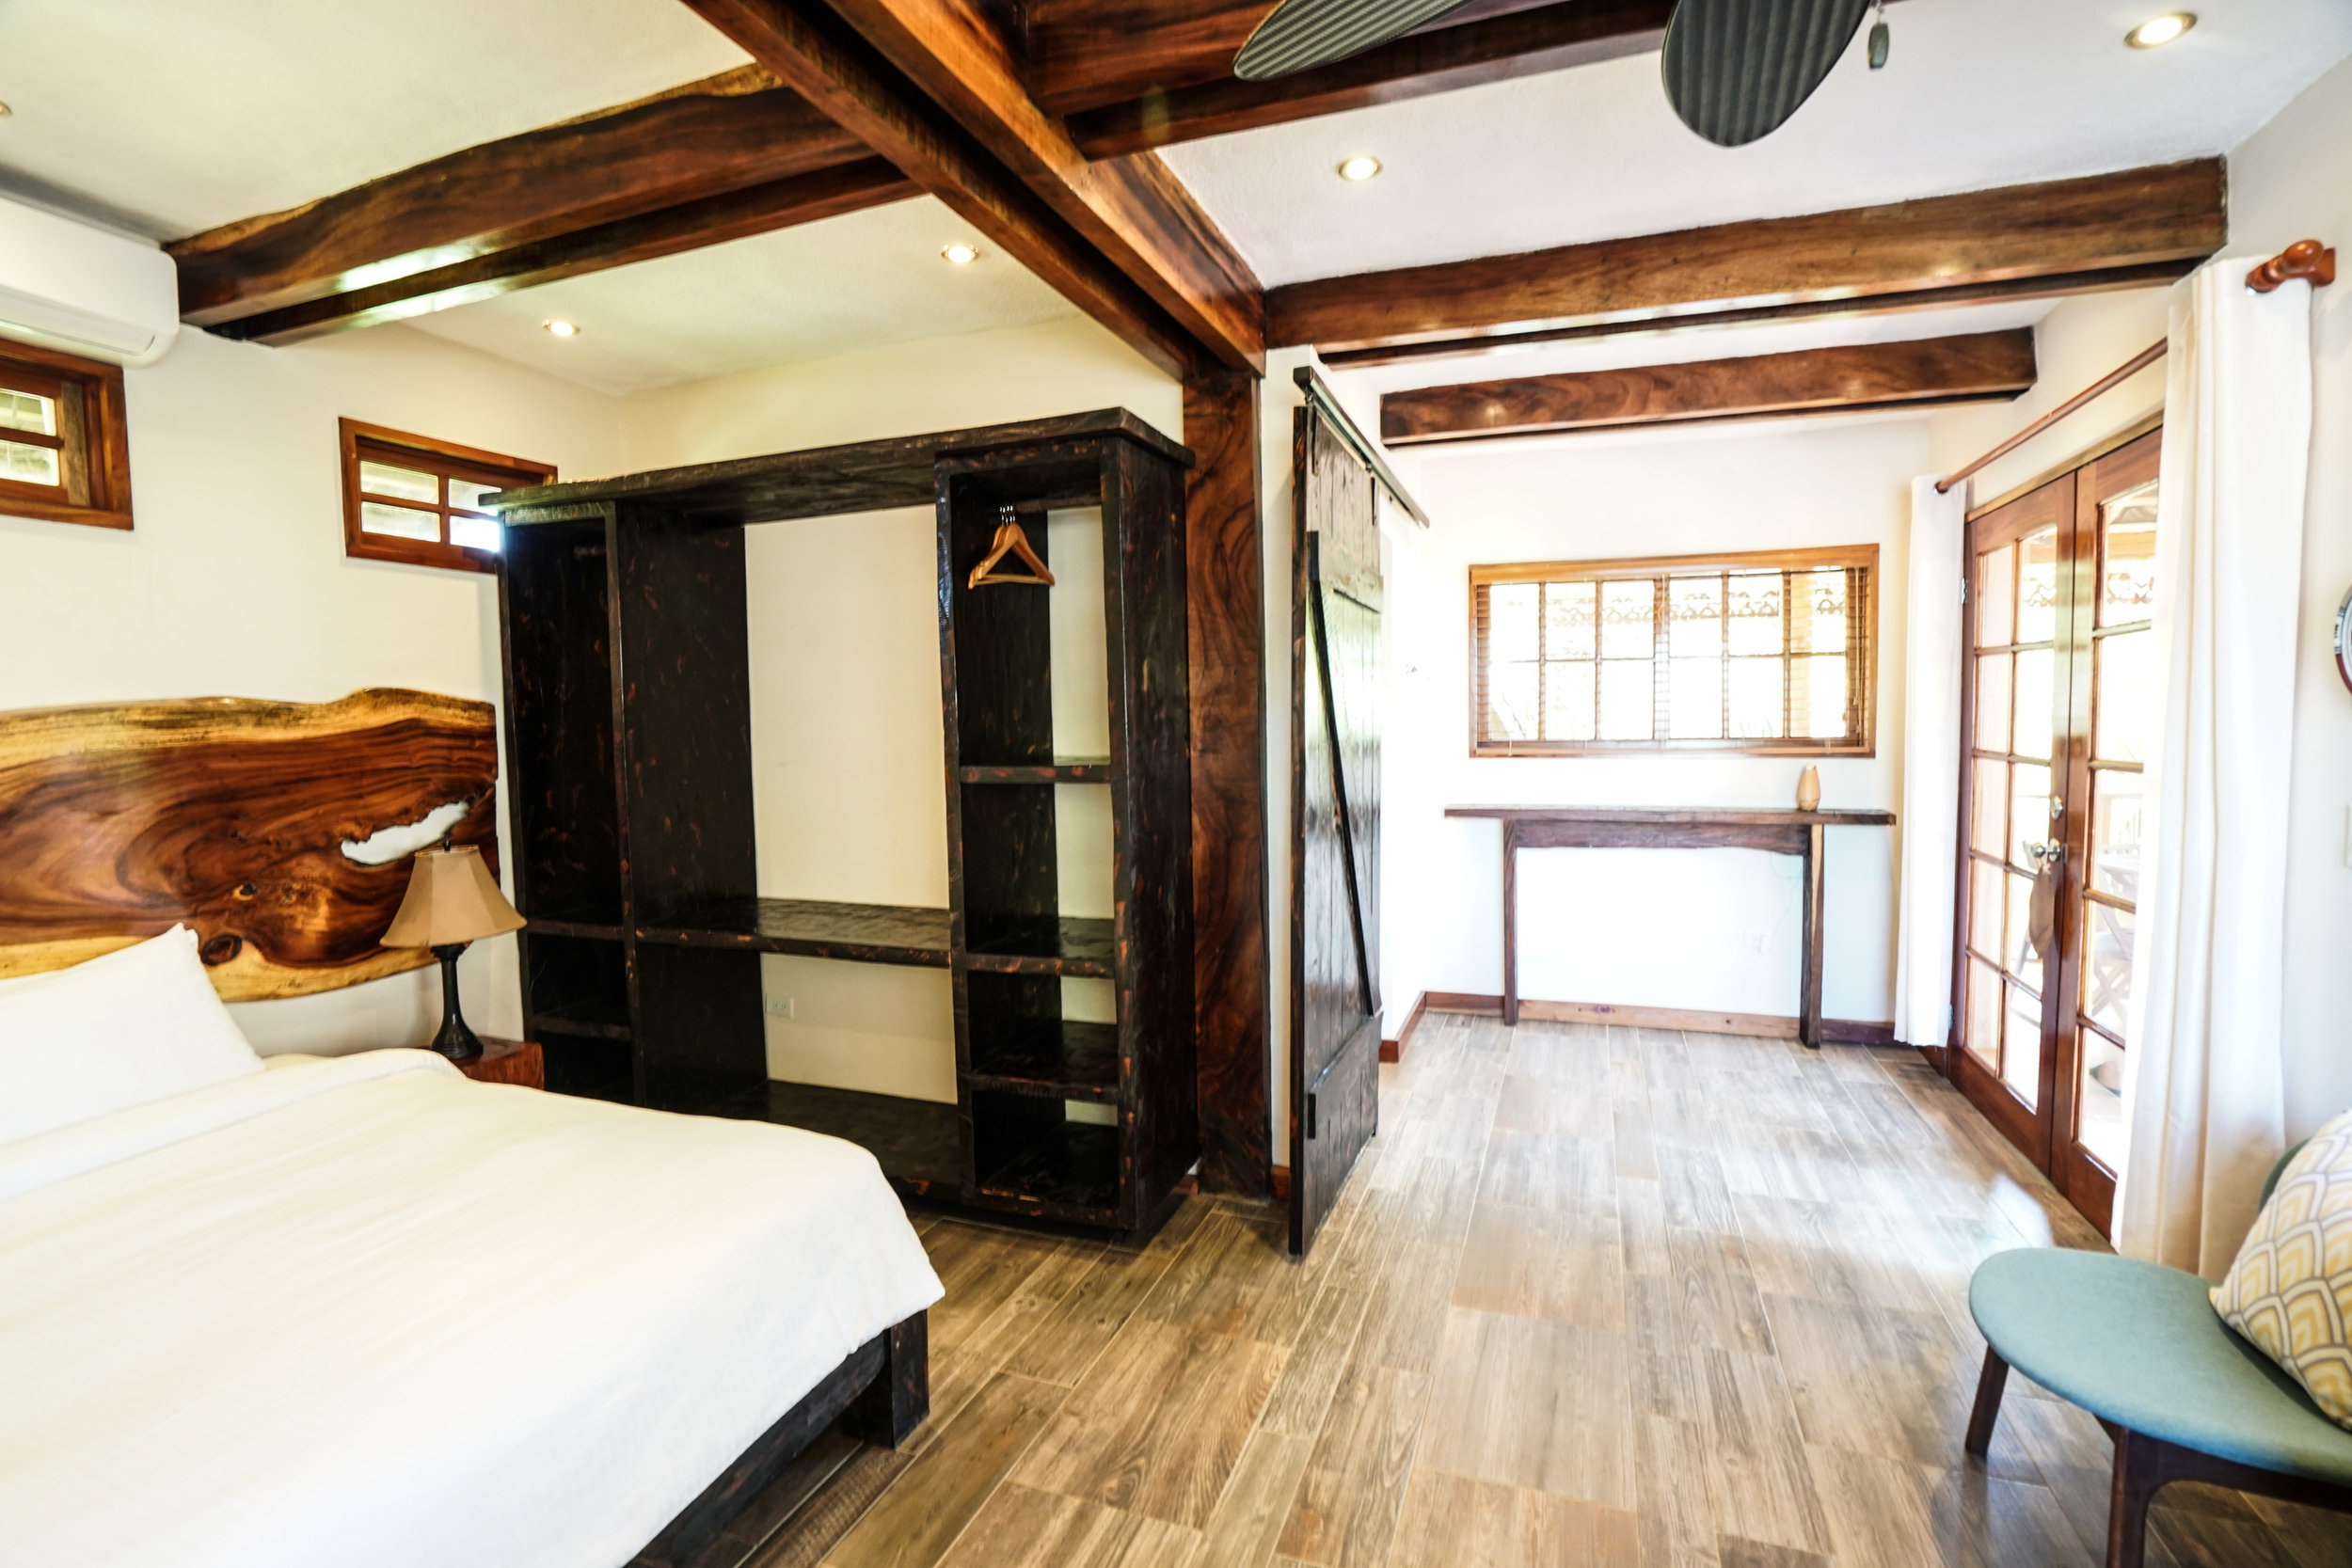 Sansara_Resort_Cabana_RioGrande_Lowres-7.jpg